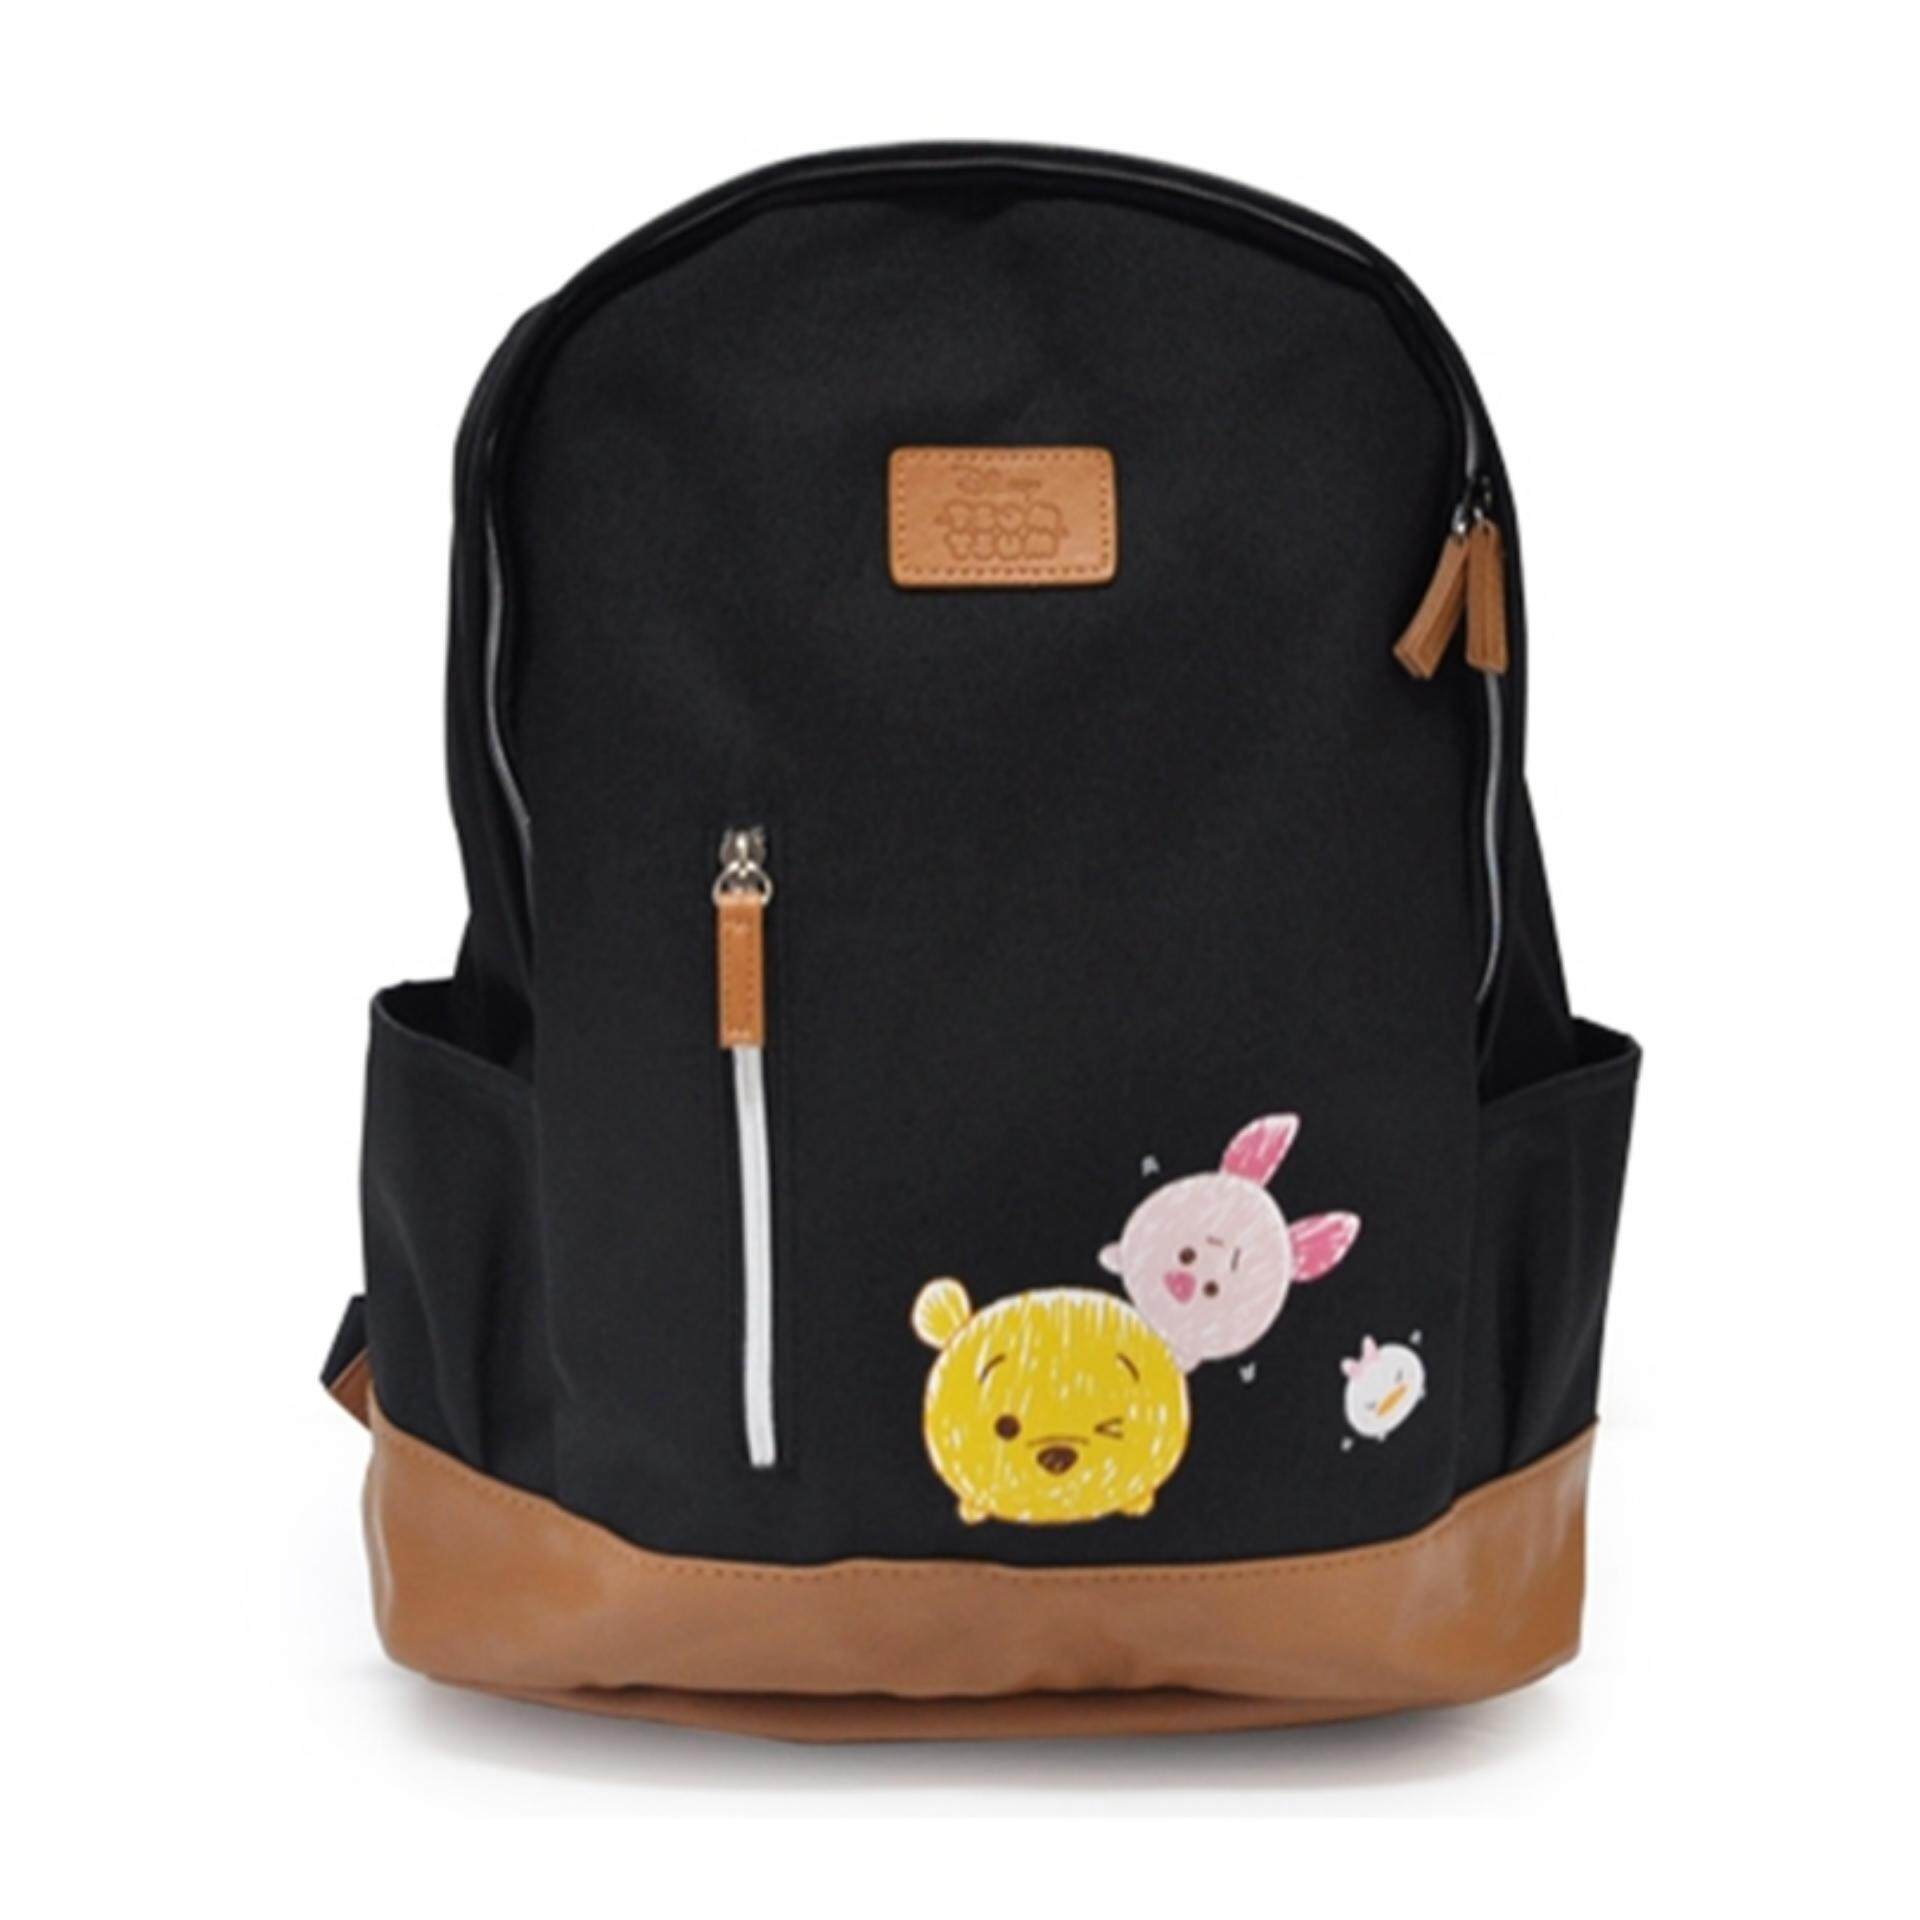 "Disney Tsum Tsum Backpack 15.5"" Inches - Winnie The Pooh Black Colour"